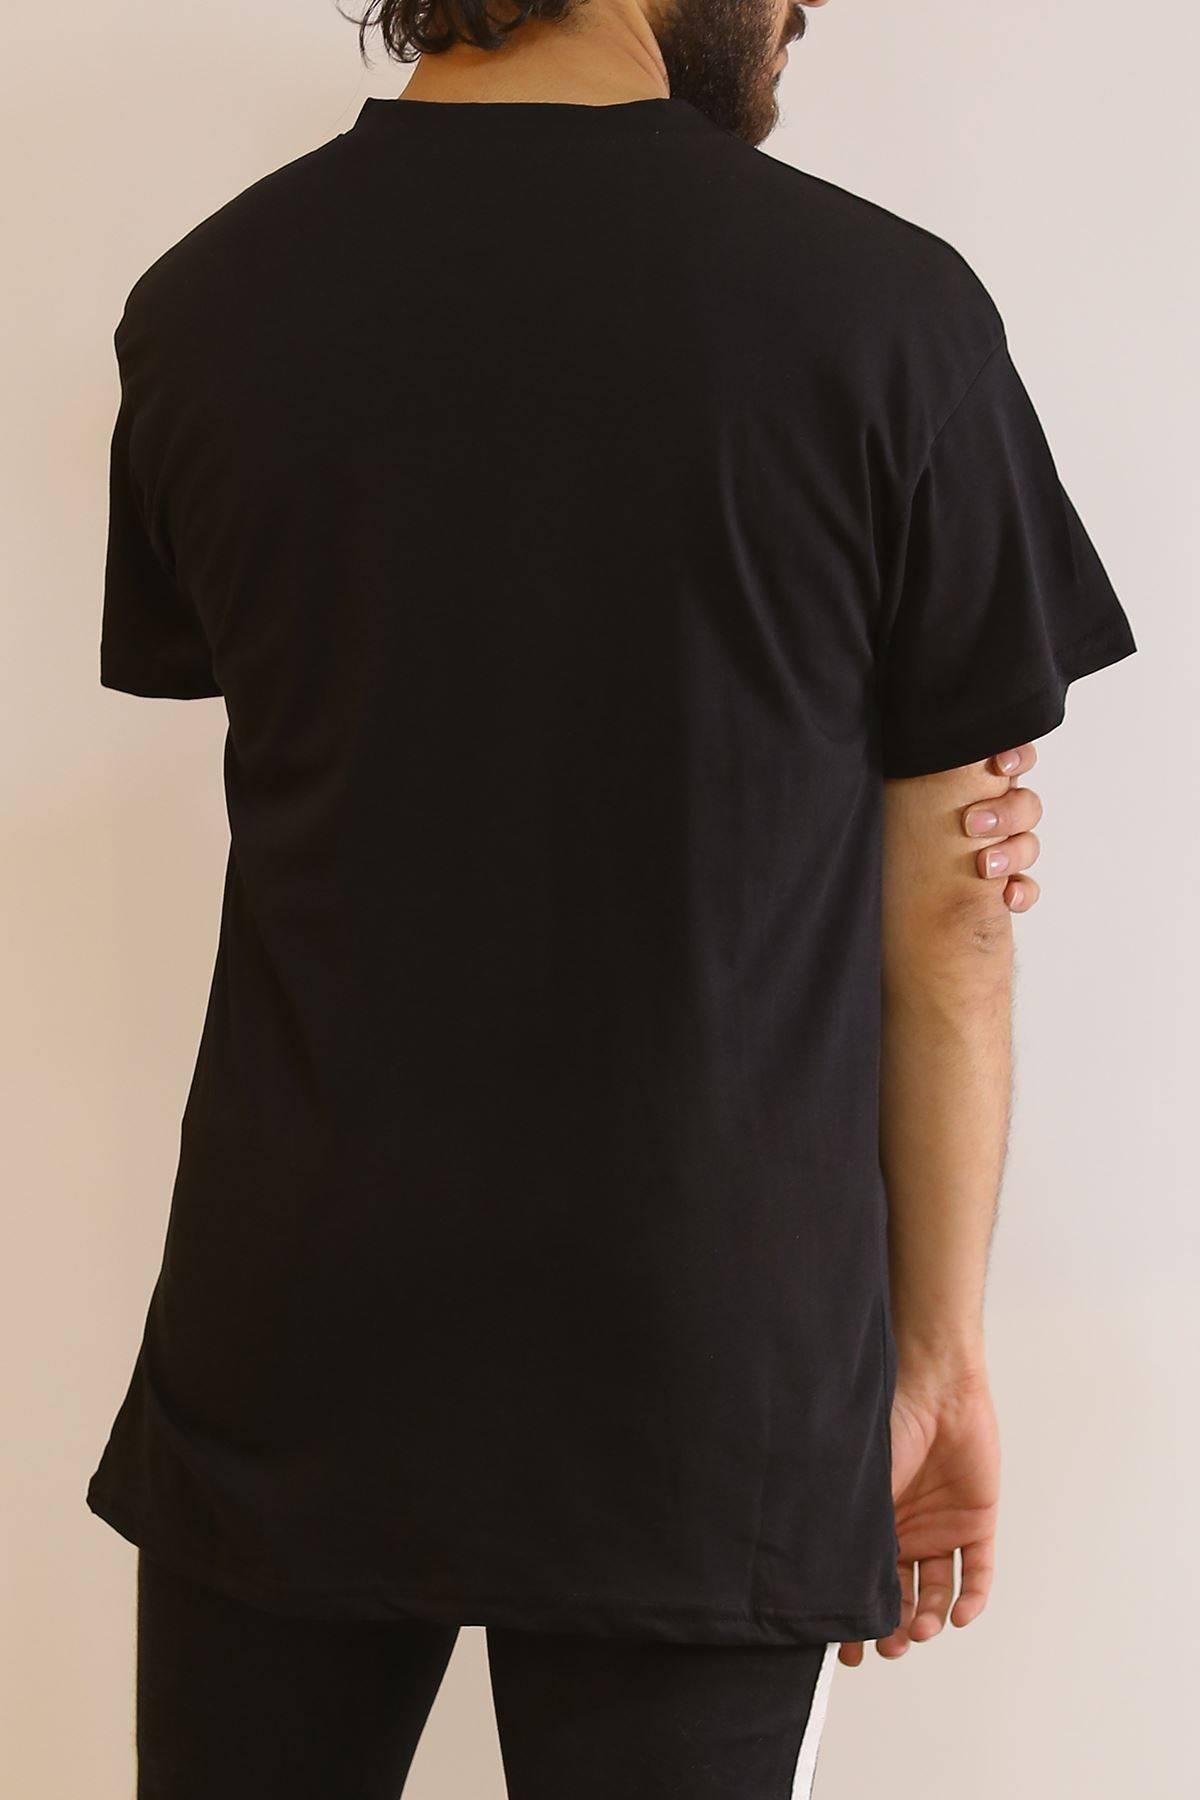 Ejderha Baskılı Tişört Siyah - 6063.1377.